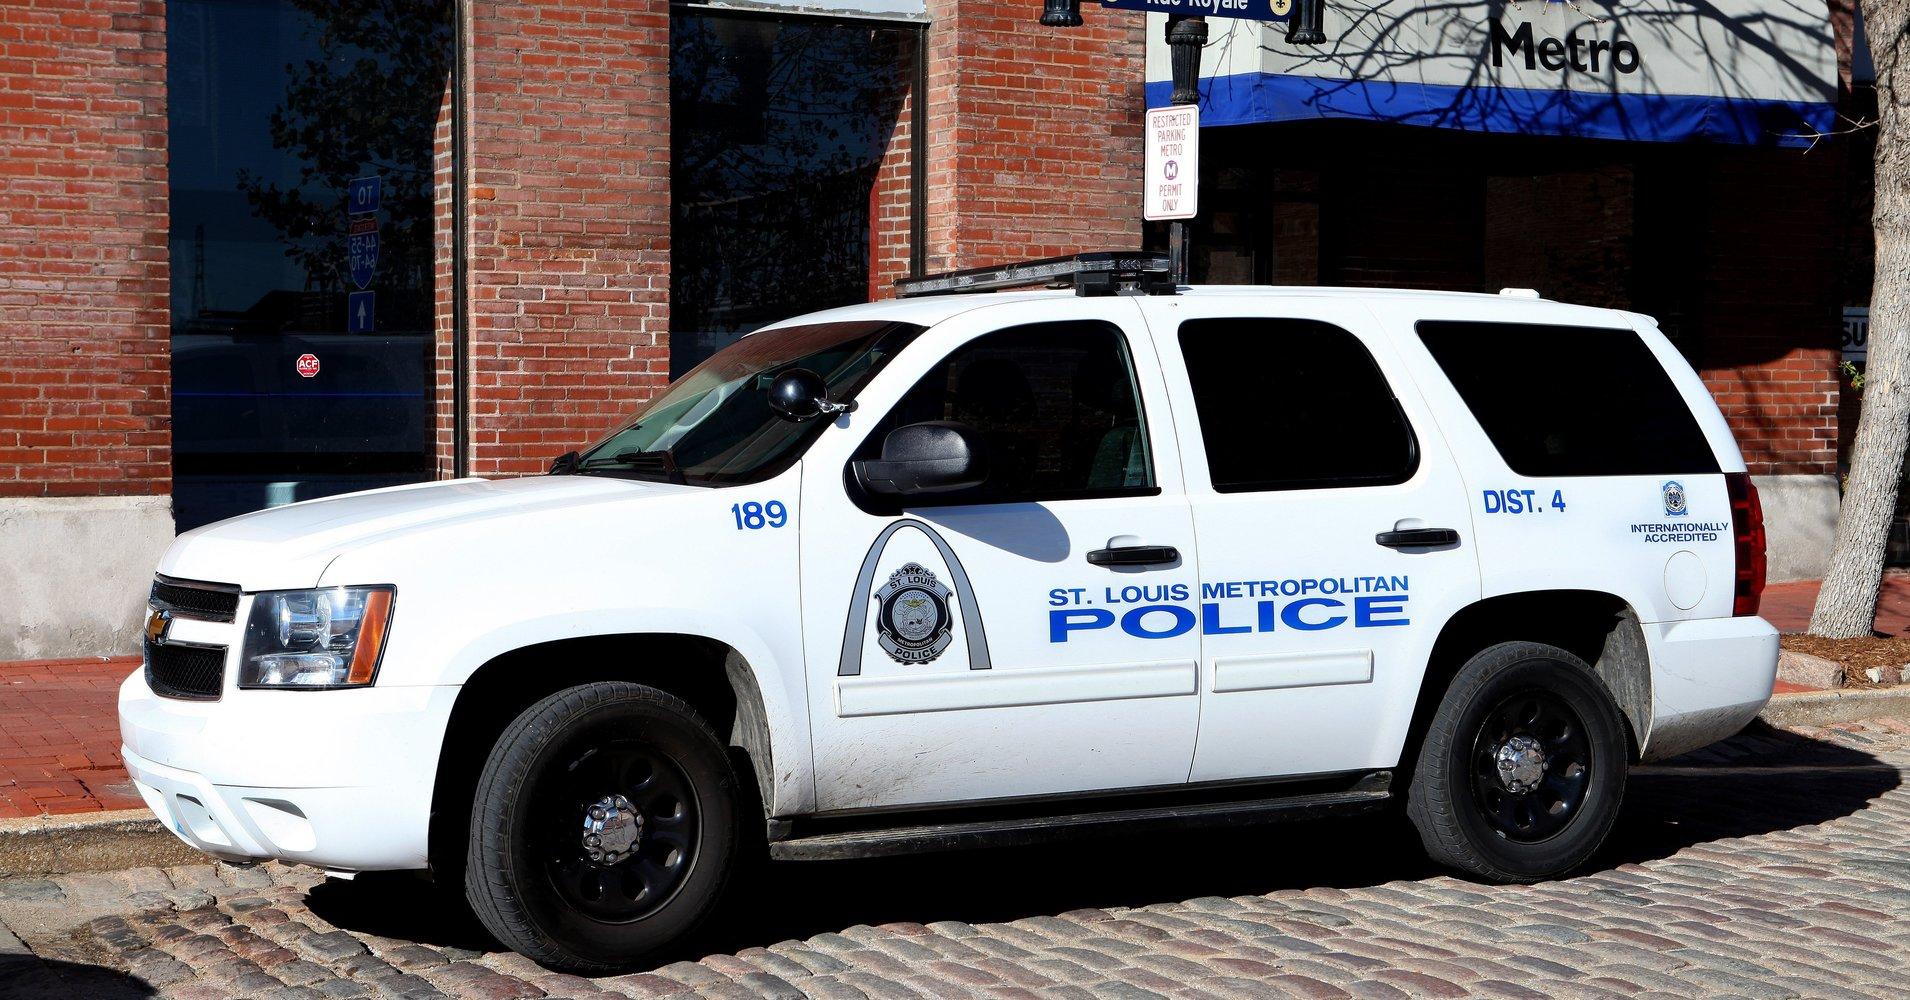 St. Louis police.jpeg